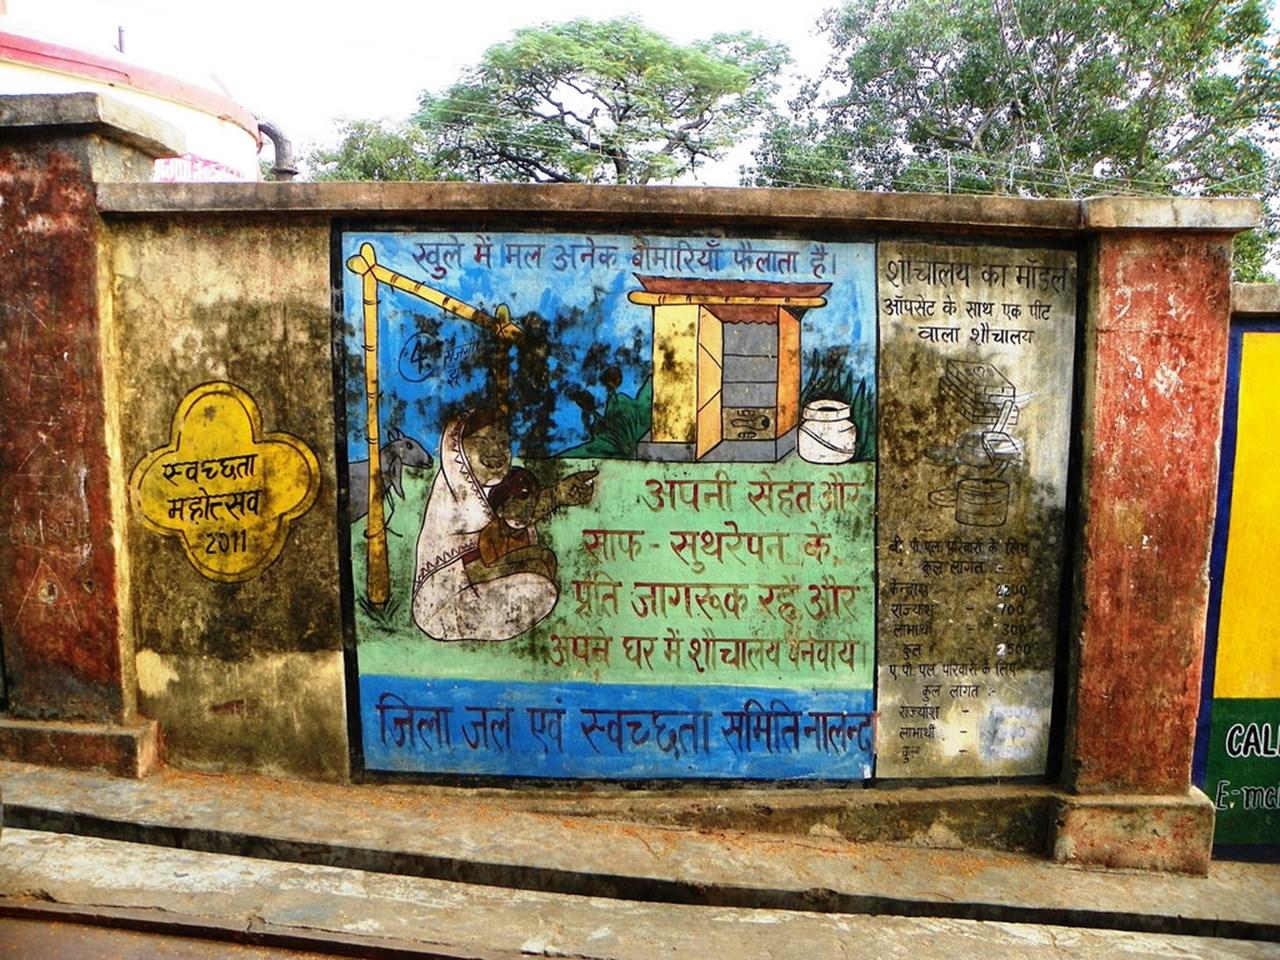 Swachh Bharat Gramin confirms 93 percent usage of toilets